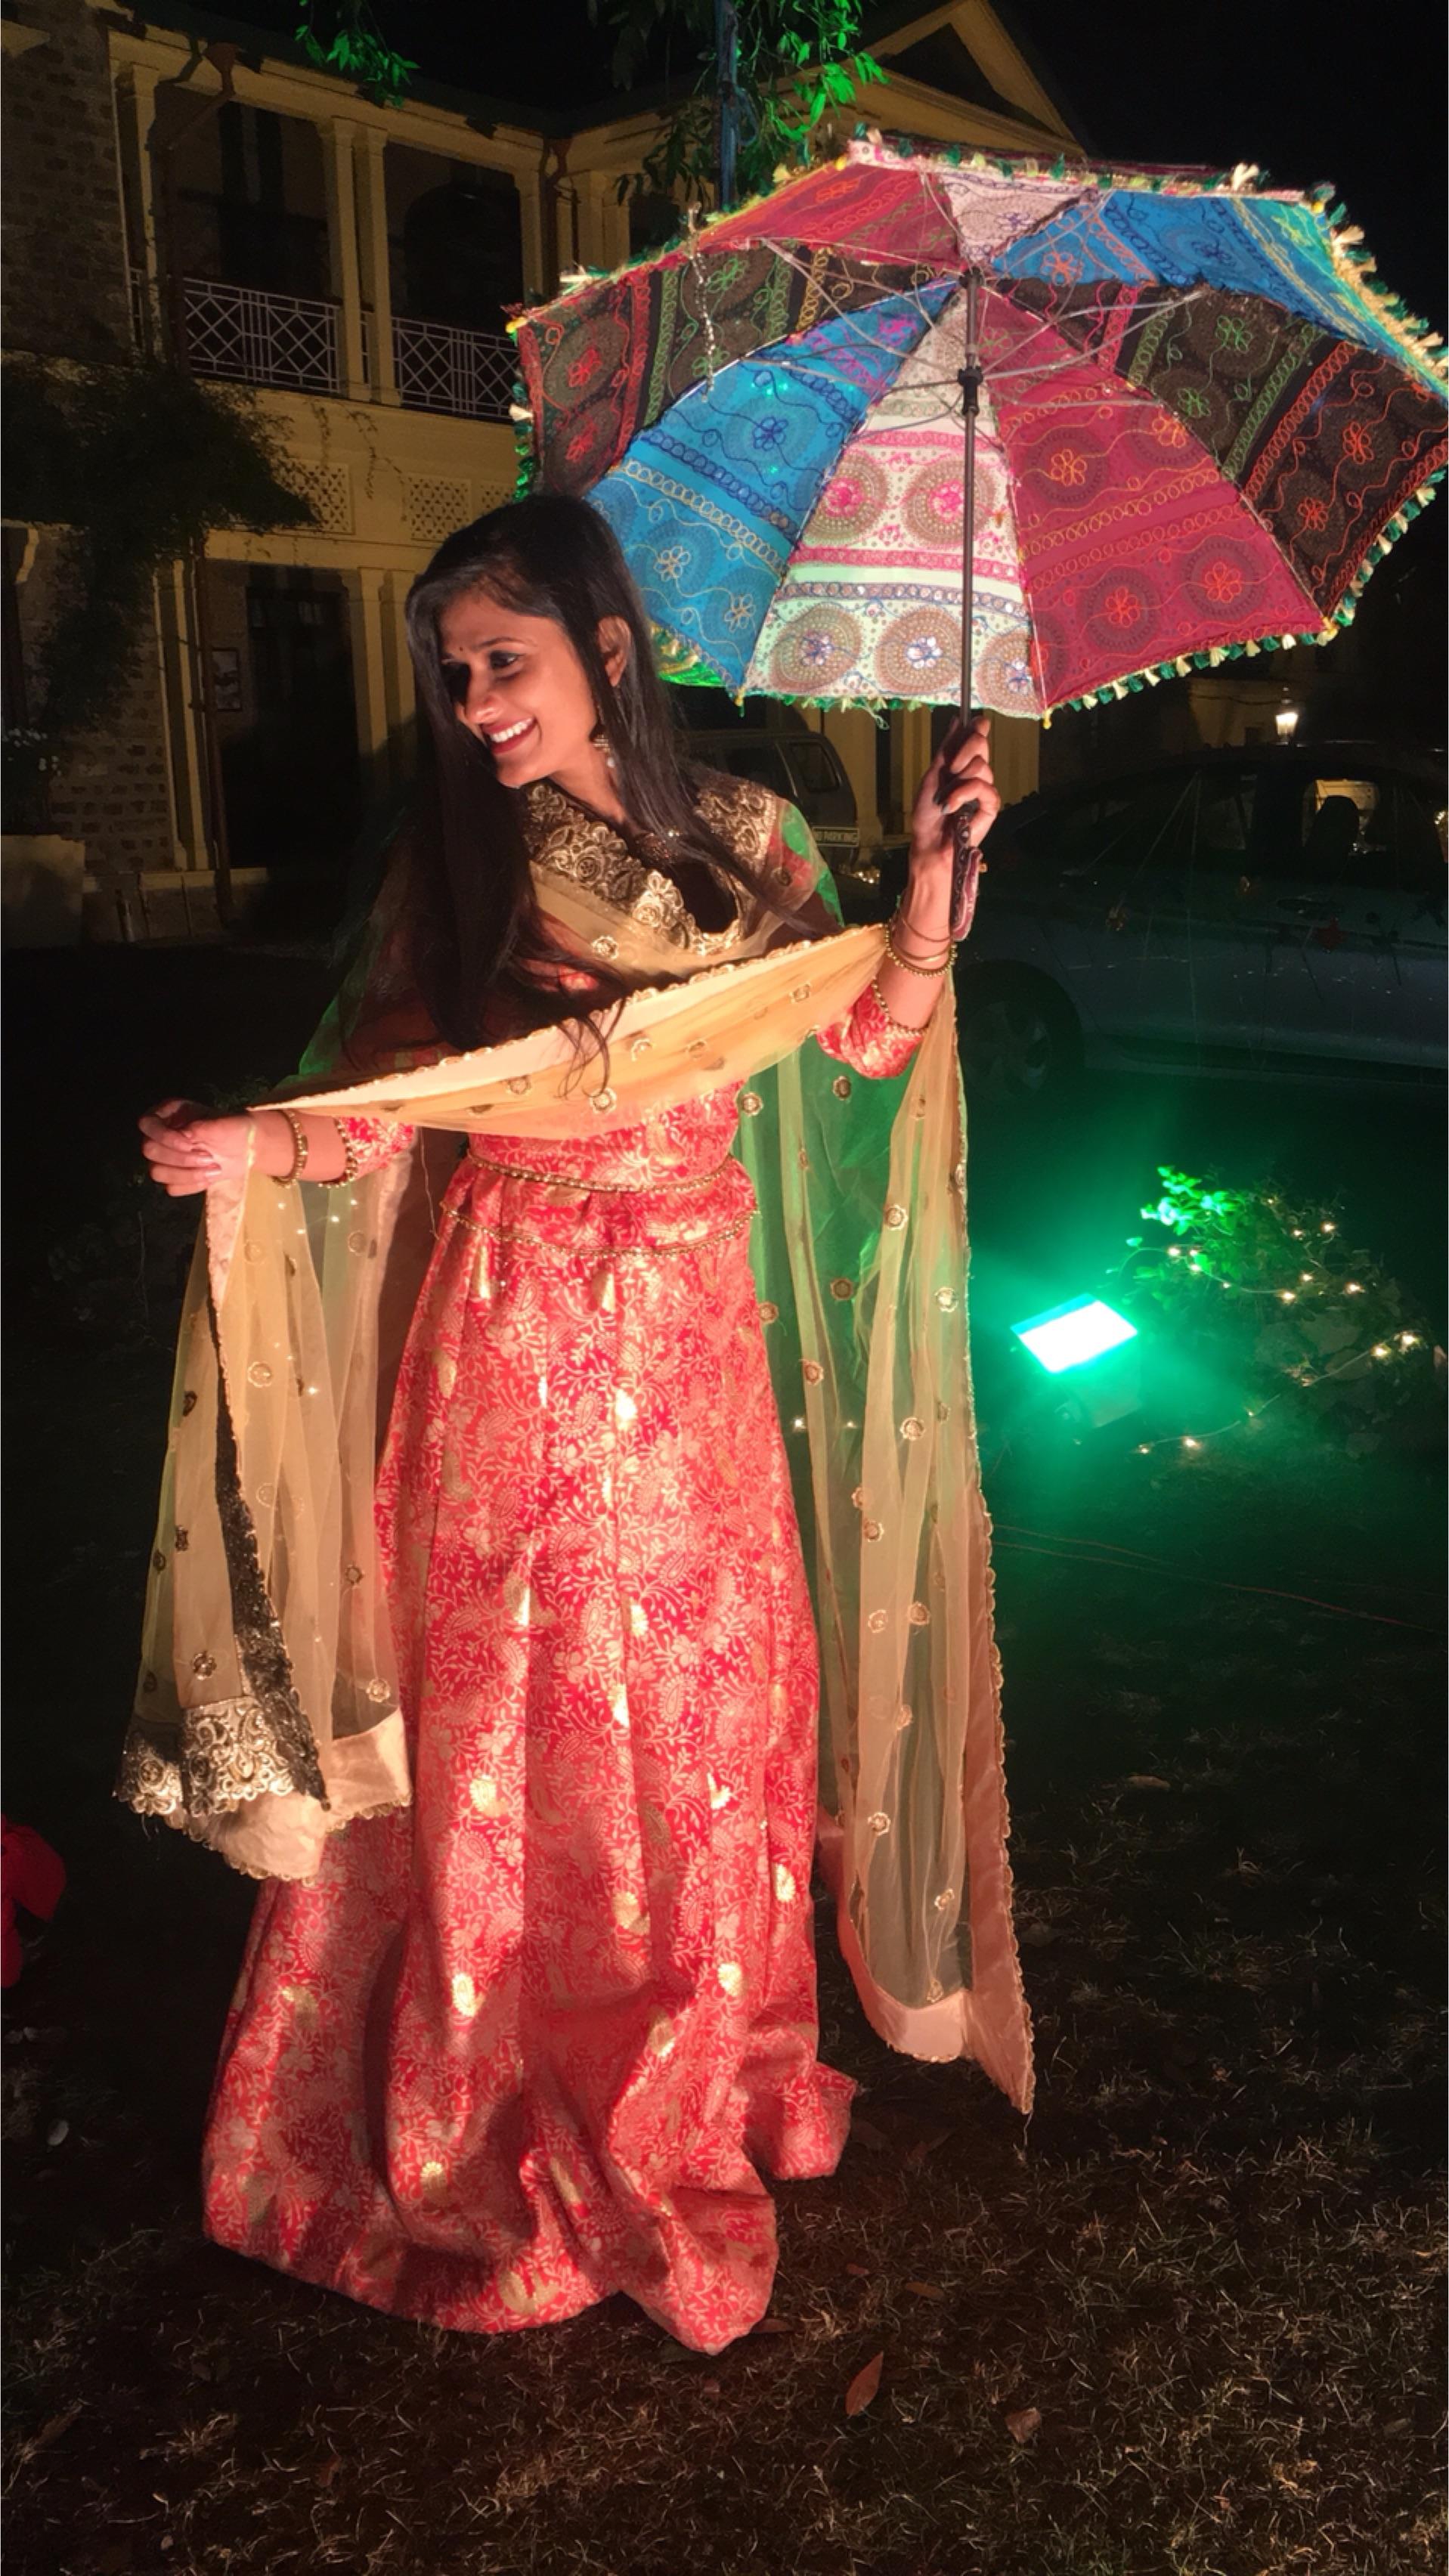 #weddingseason #ethnic-wear #fashionbloggerindia #lehenga #golden #red #roposo #roposo-style